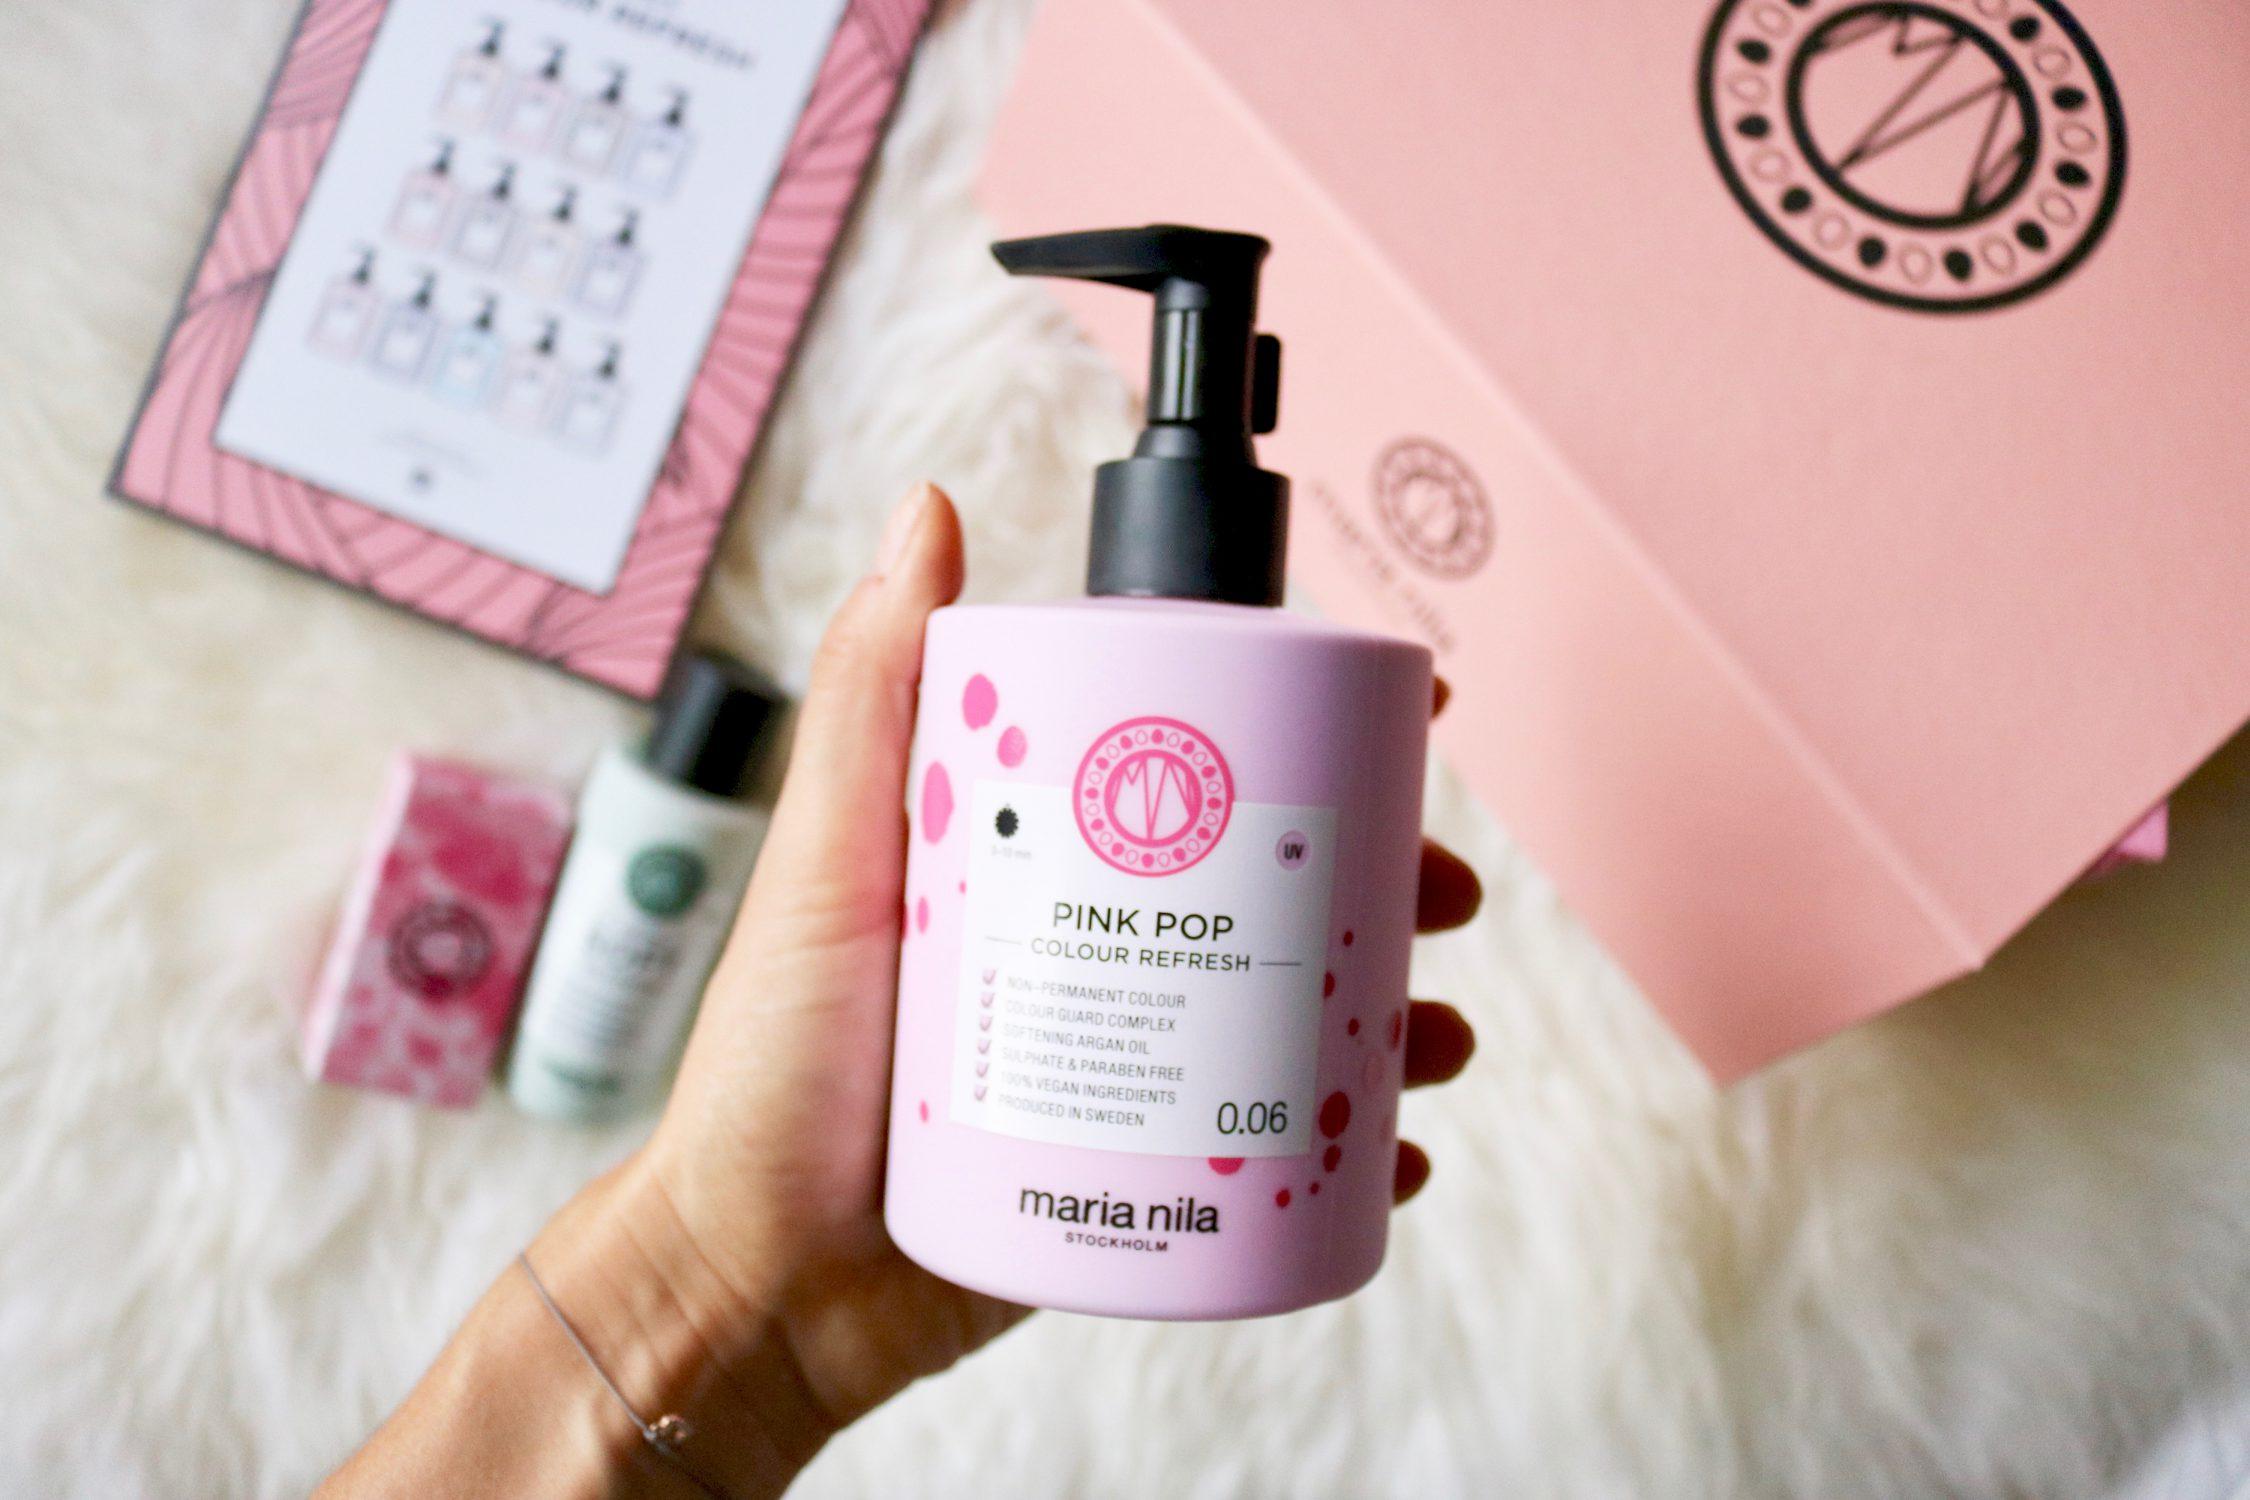 Colour Refresh Farbe Pink Pop KLIPP Frisör Friseur